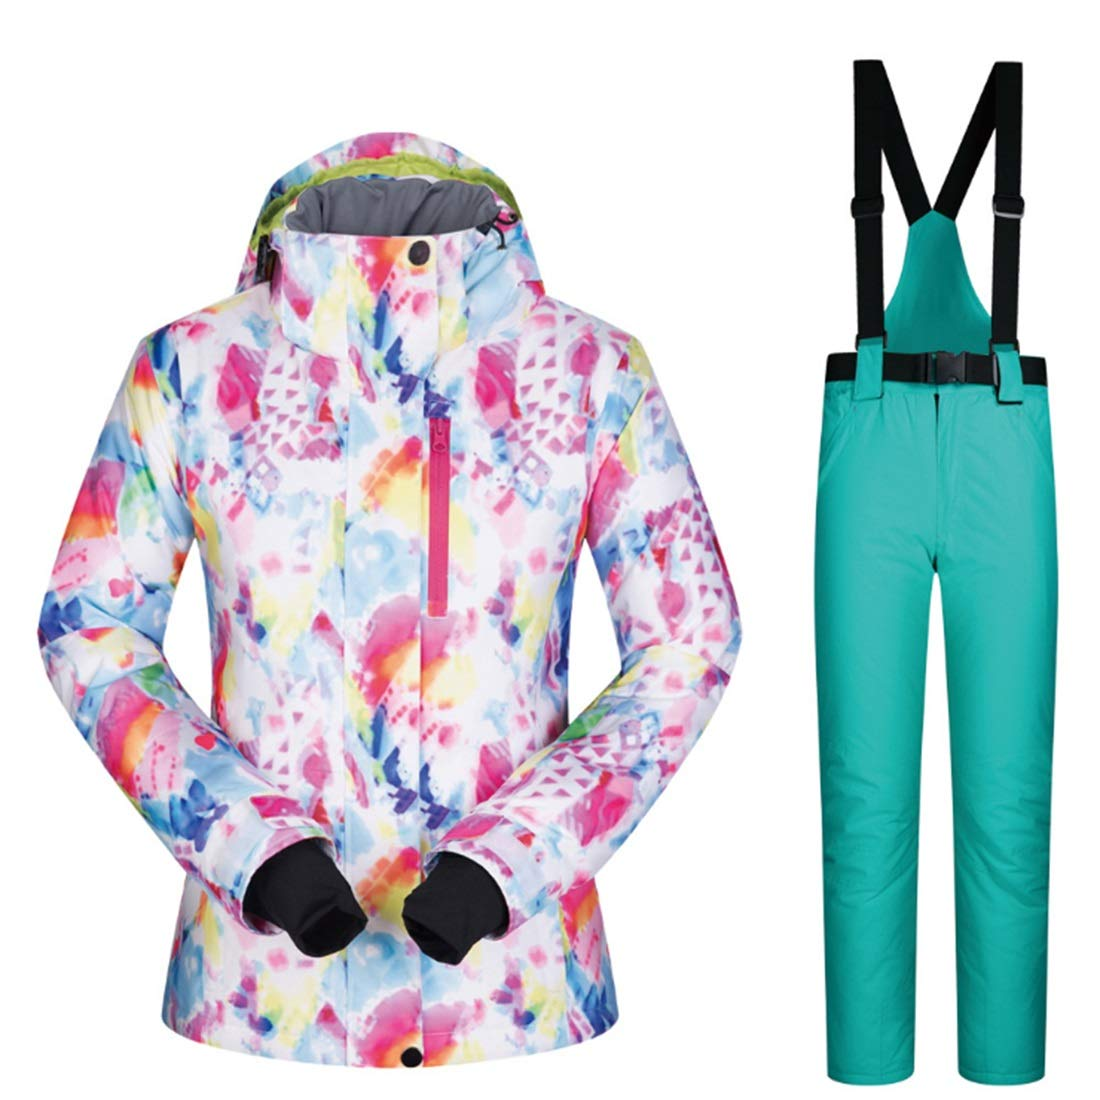 Jhcpca 女性のスキージャケットハイ防風防水技術スノージャケット  M